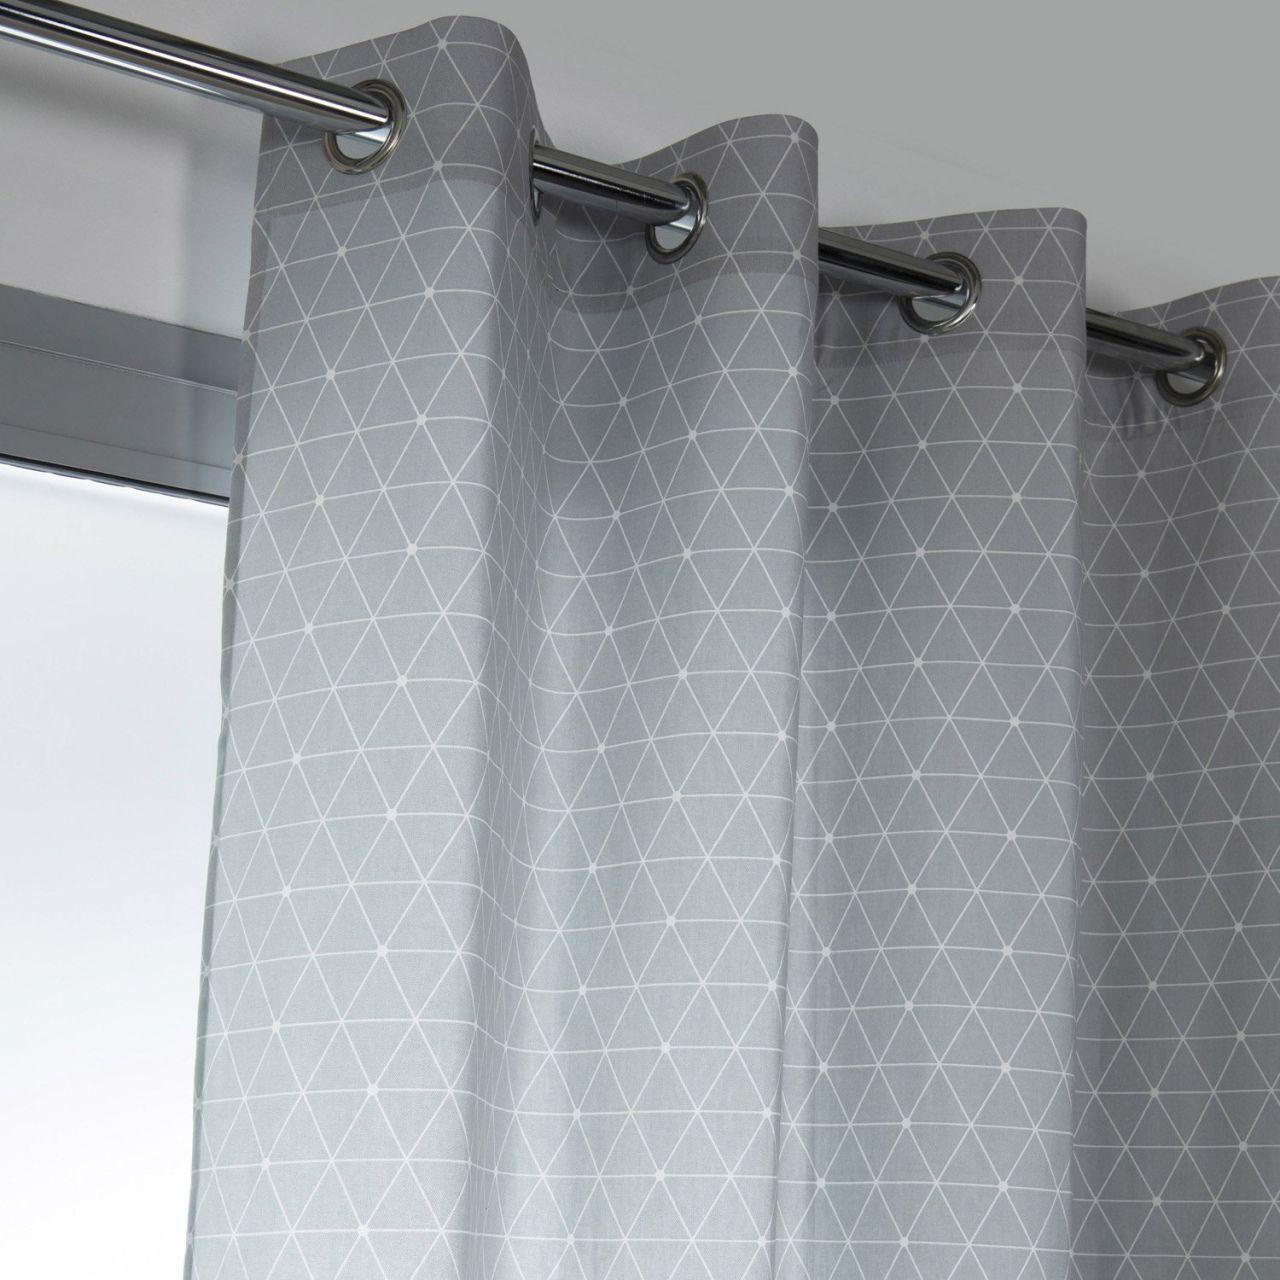 7 meilleurs rideau style scandinave rideau style scandinave rideaux chambre rideau scandinave